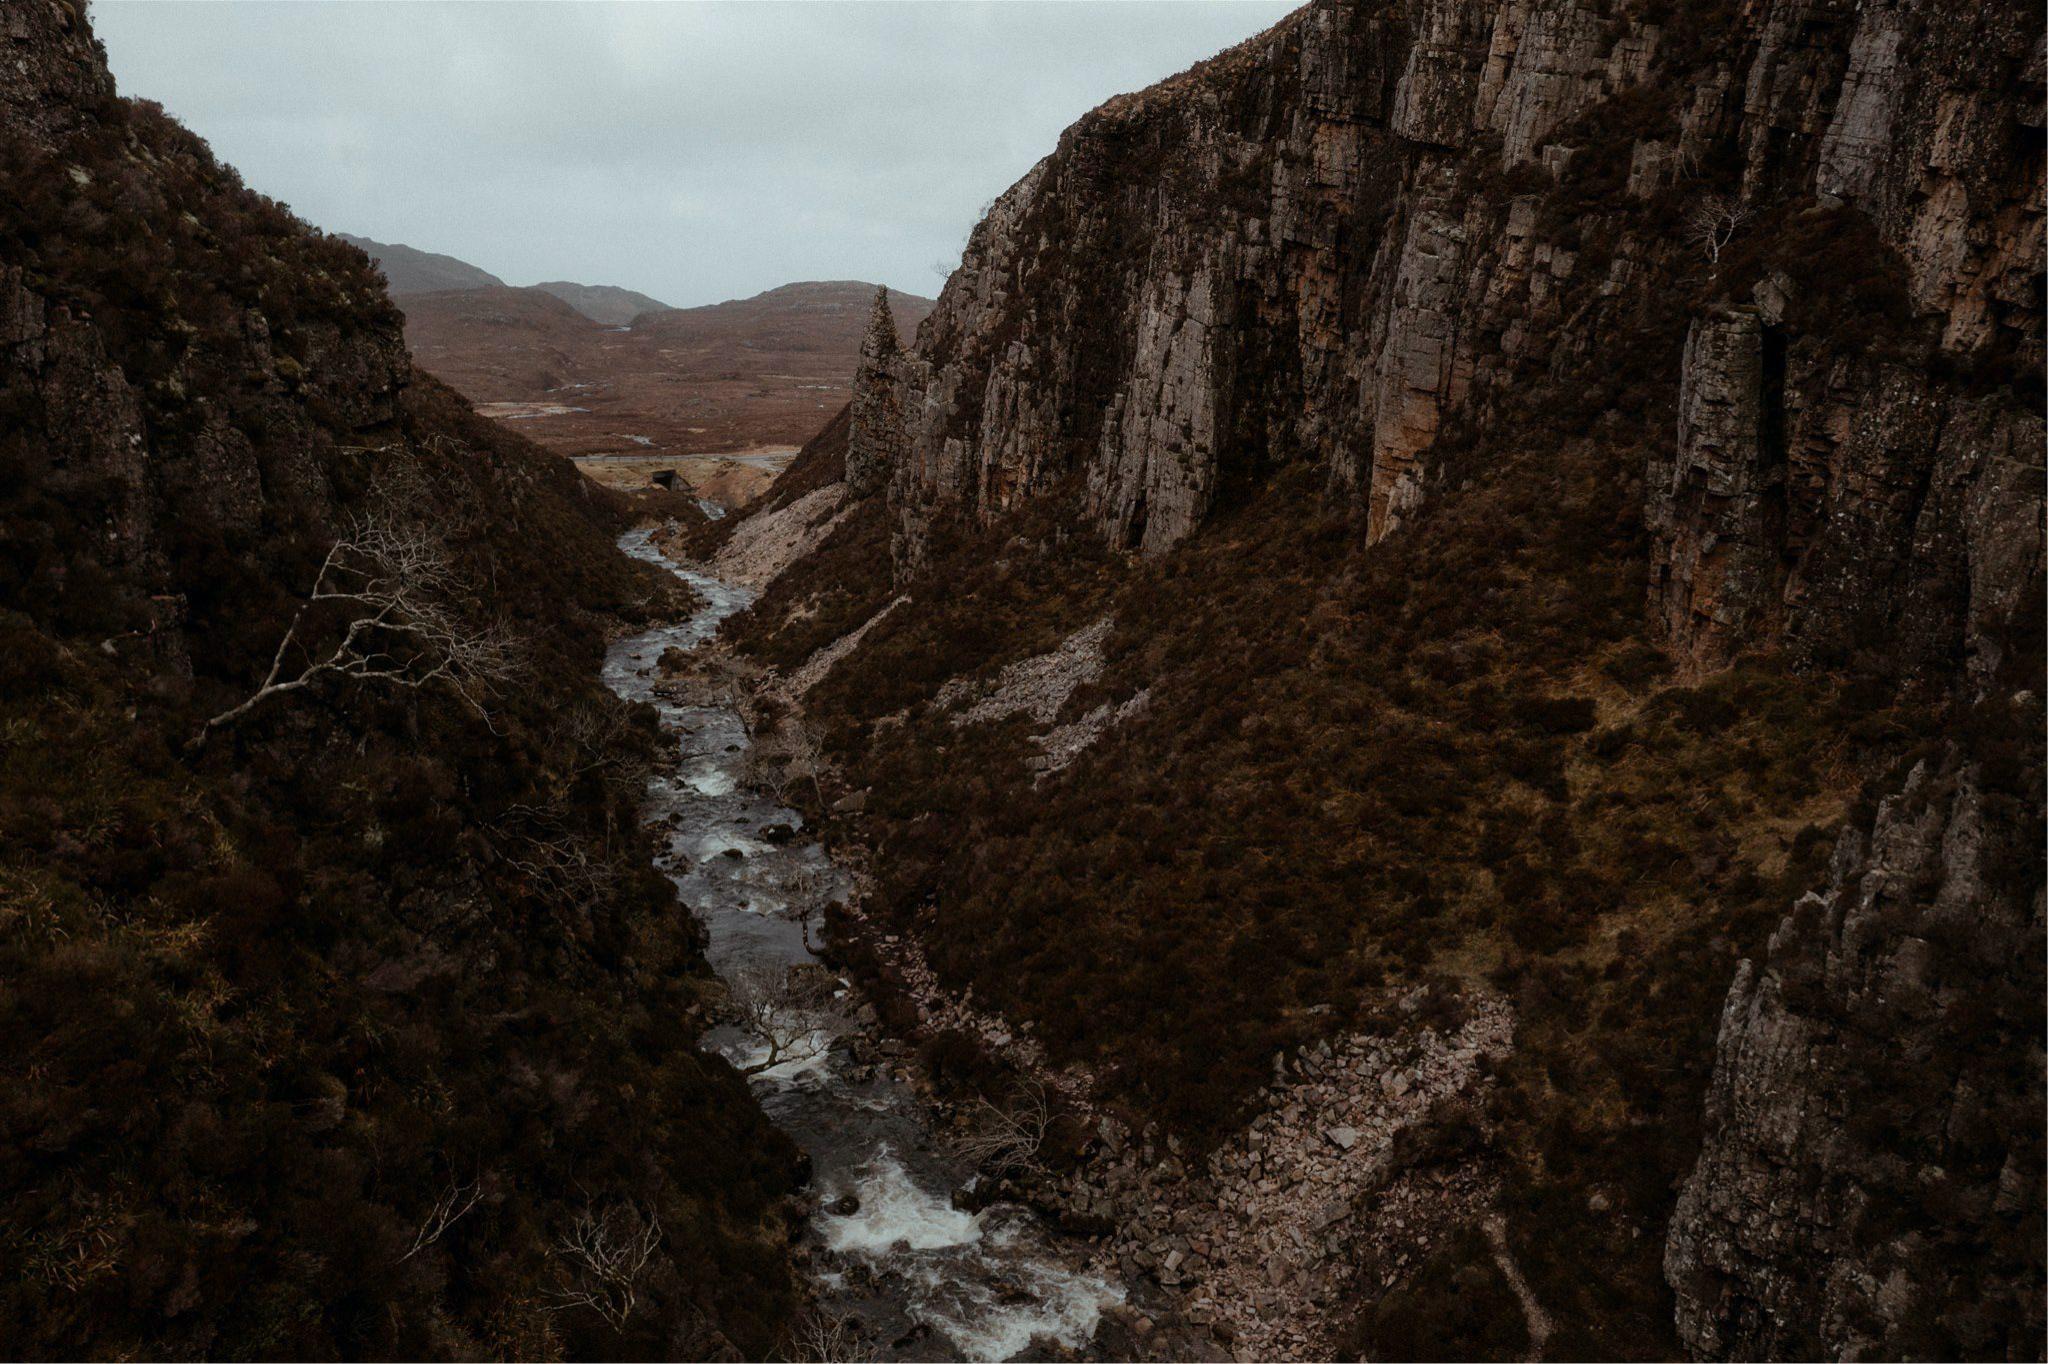 River running through a gorge in Assynt, Scotland